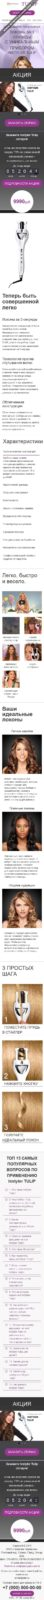 Скриншот лендинга Стайлер для волос TULIP by InStyler 001